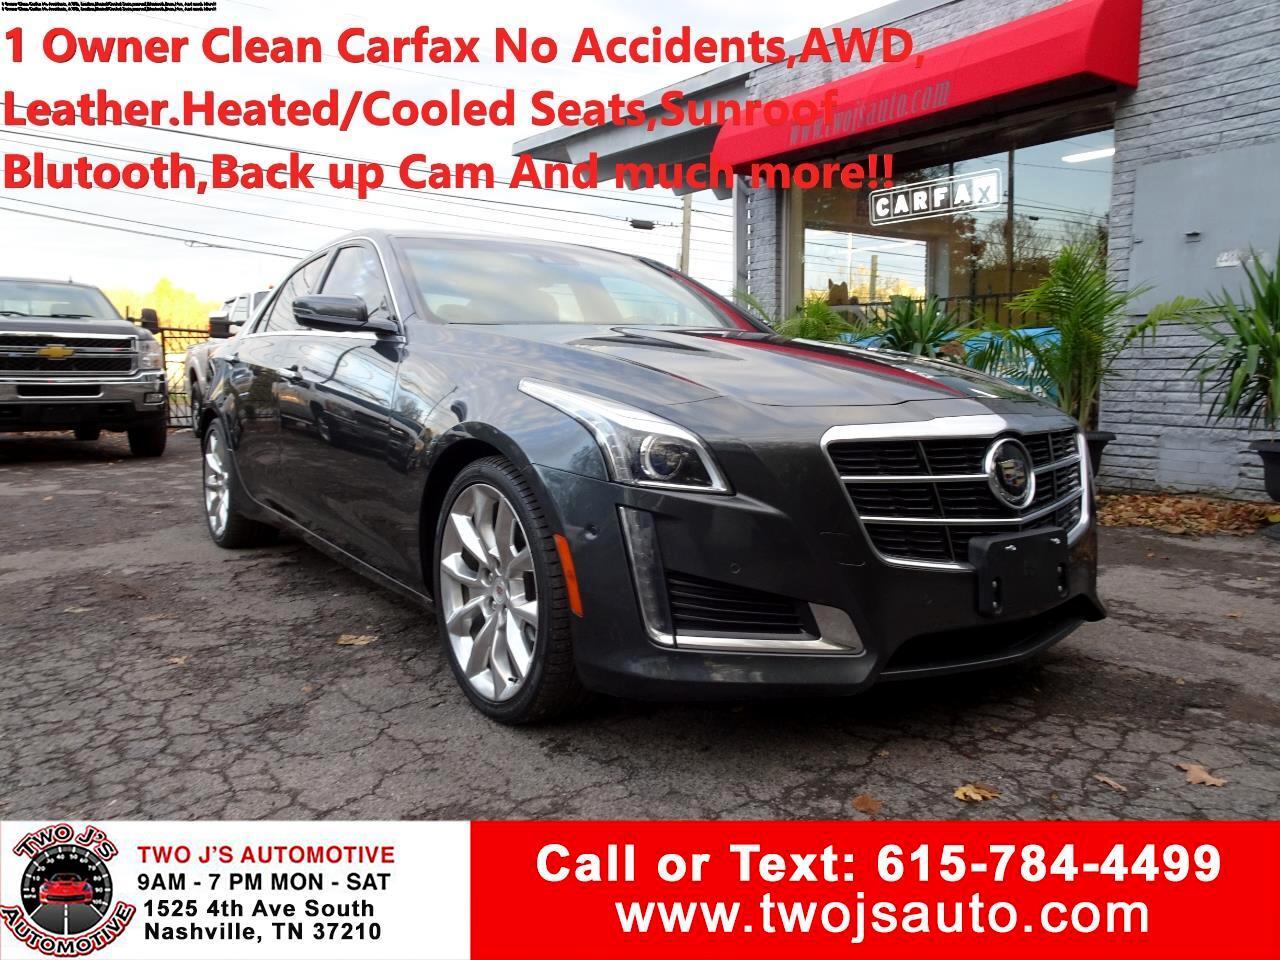 2014 Cadillac CTS Sedan 4dr Sdn 2.0L Turbo Premium AWD